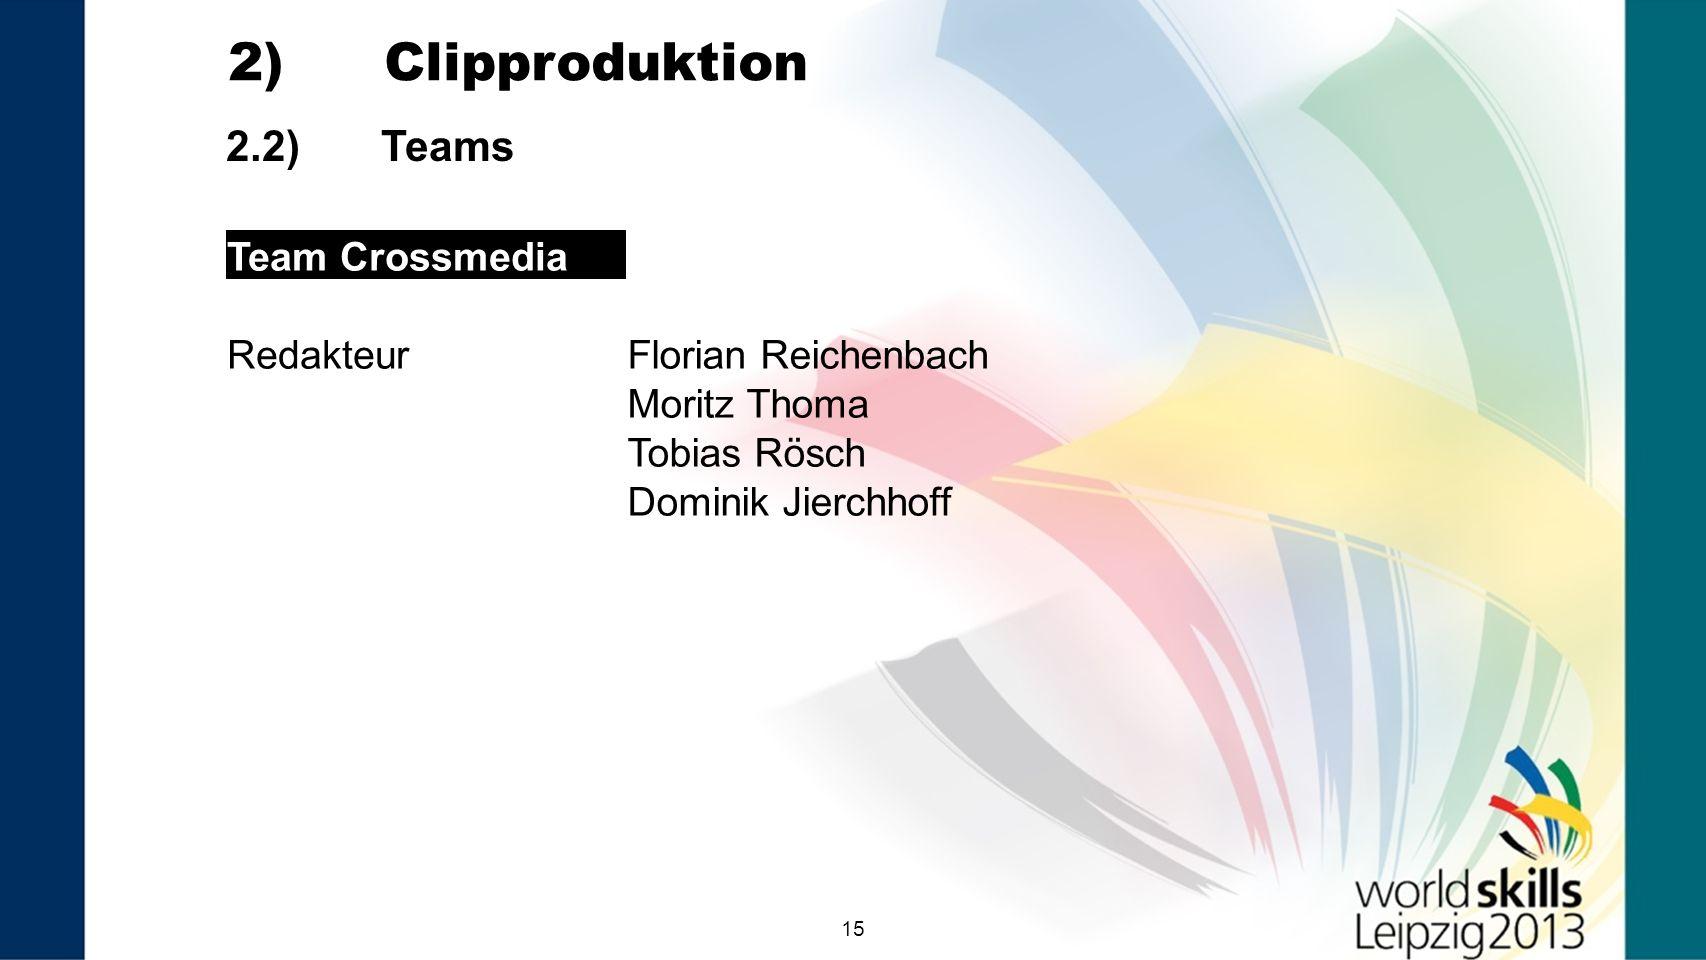 15 2.2) Teams 2) Clipproduktion Team Crossmedia RedakteurFlorian Reichenbach Moritz Thoma Tobias Rösch Dominik Jierchhoff Team 9 VNR